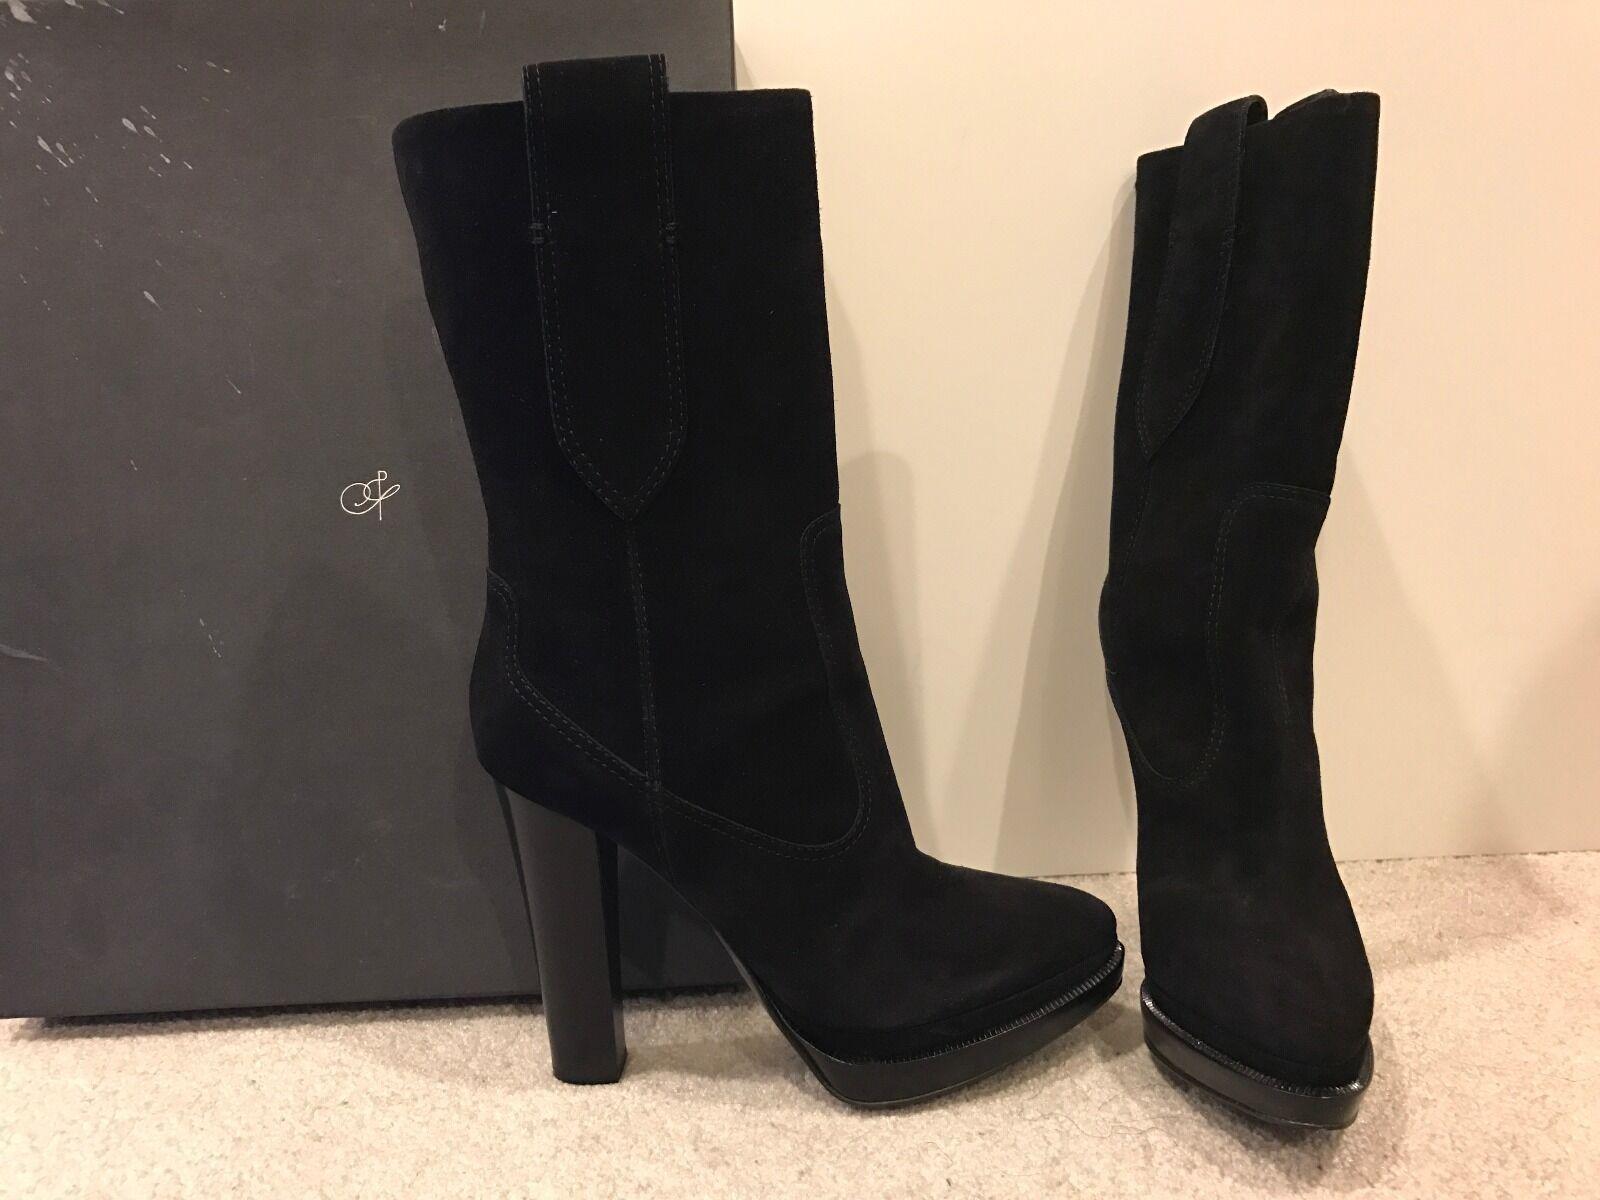 Proenza Schouler Womens Shoes Size 6/36 Boots Booties